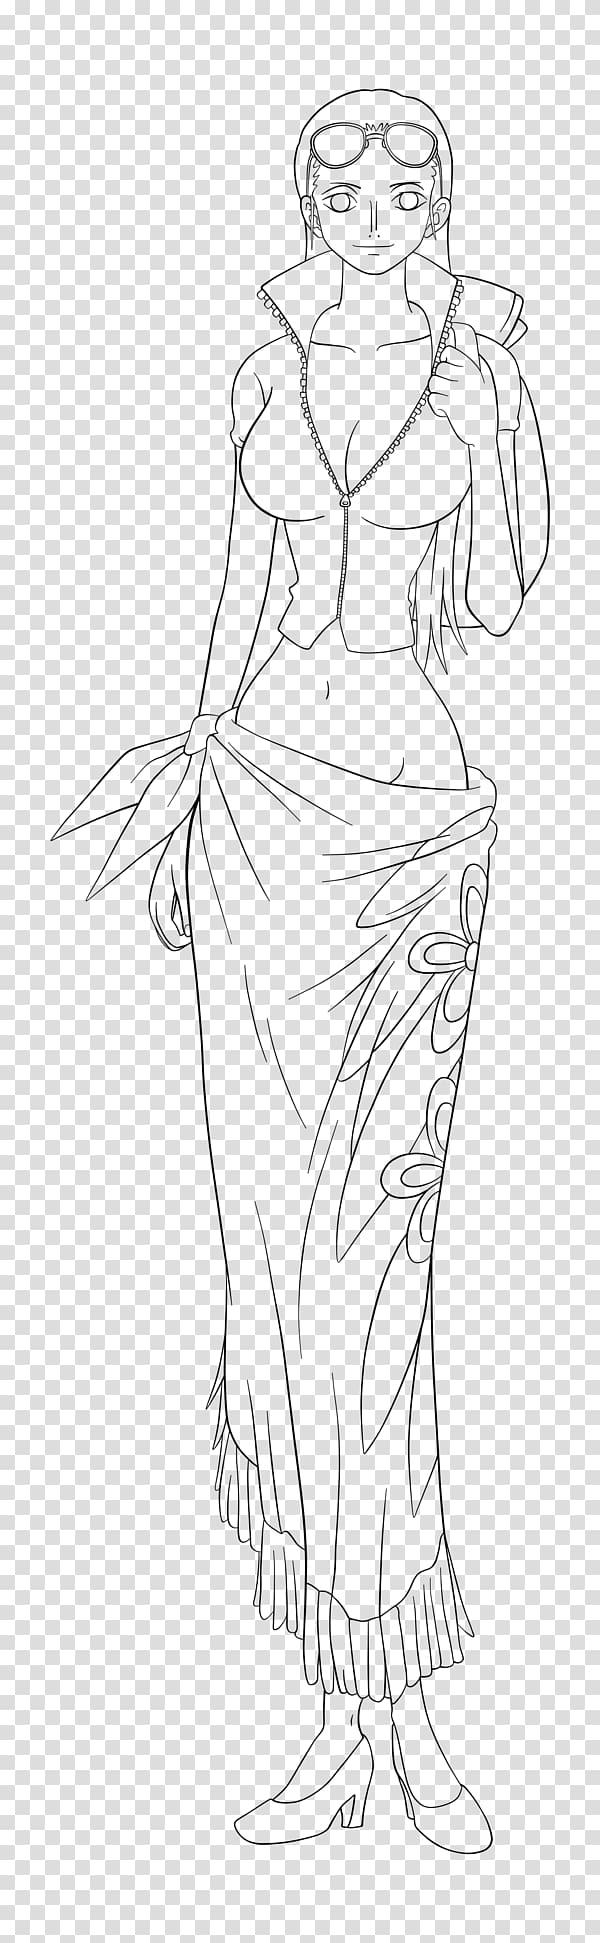 Figure drawing Line art Sketch, nico robin PNG